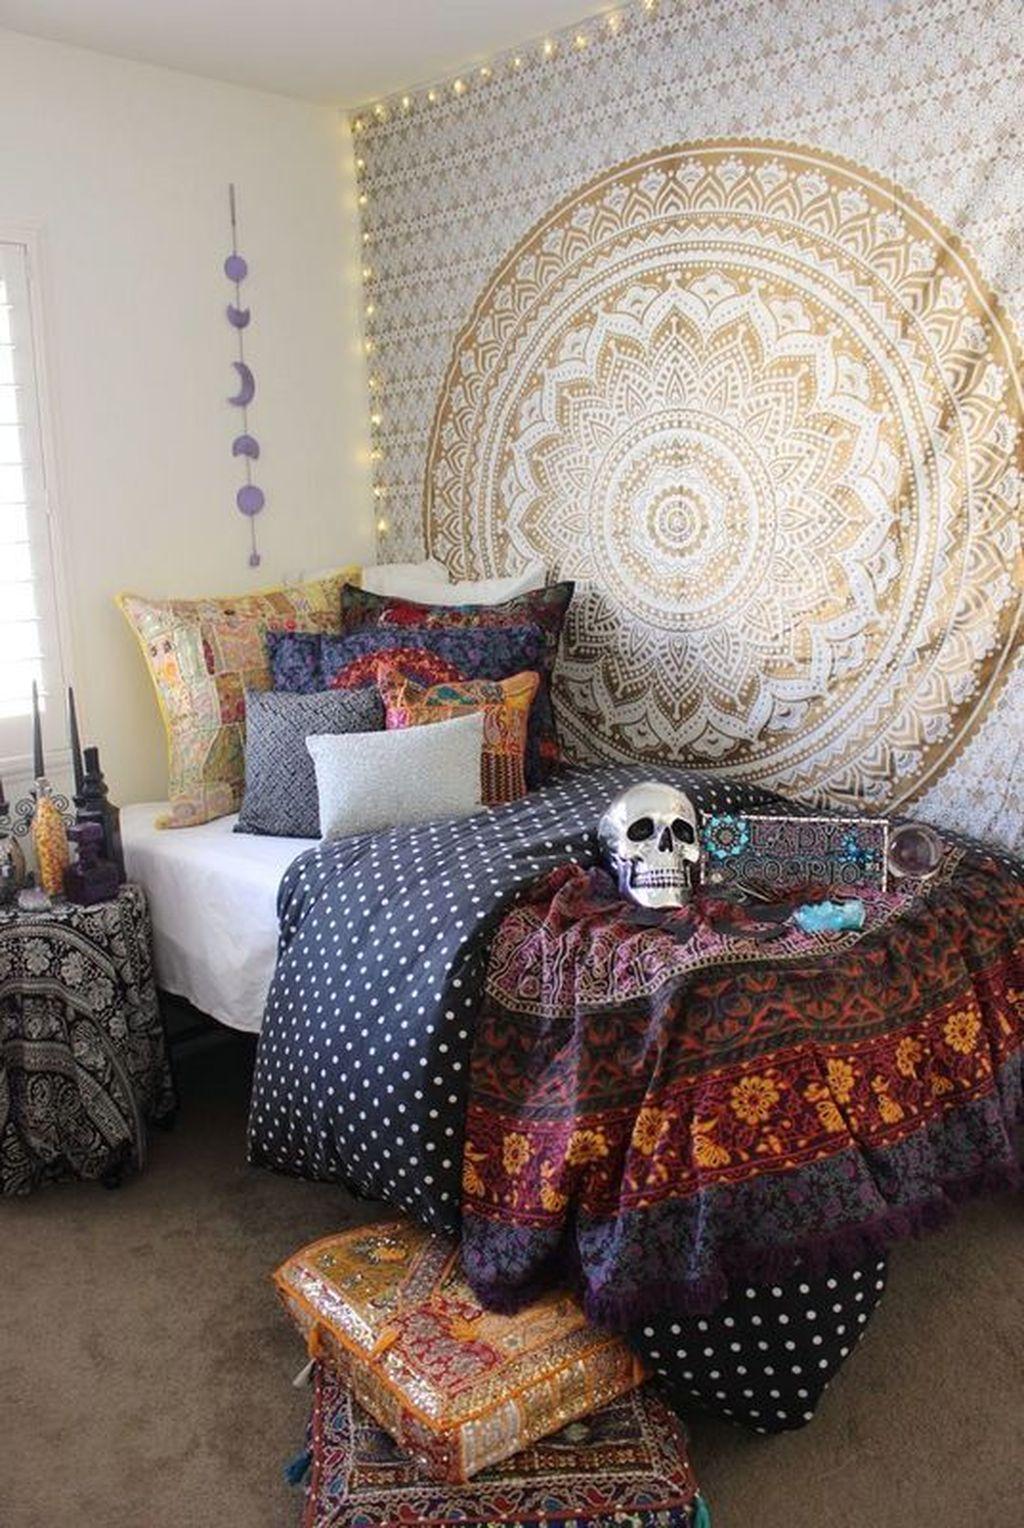 Amazing Bedroom Decoration Ideas With Halloween Theme 16